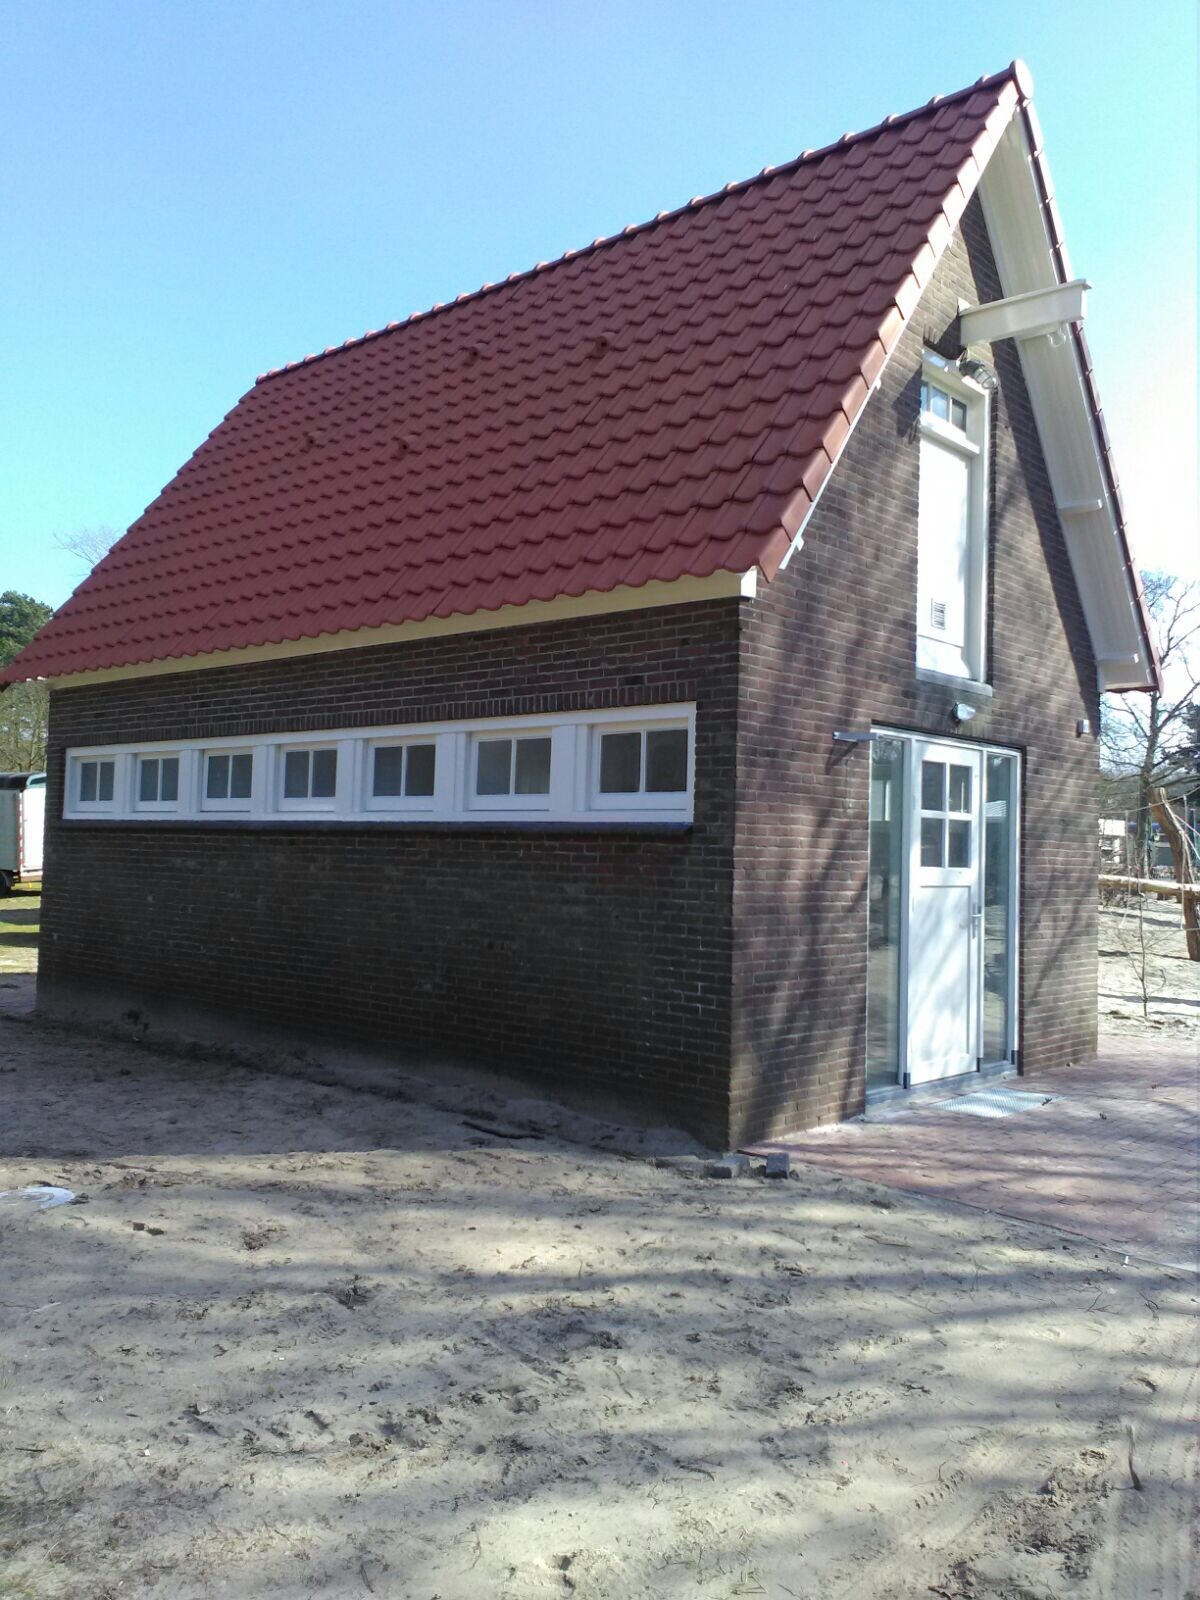 sanitairgebouw4876